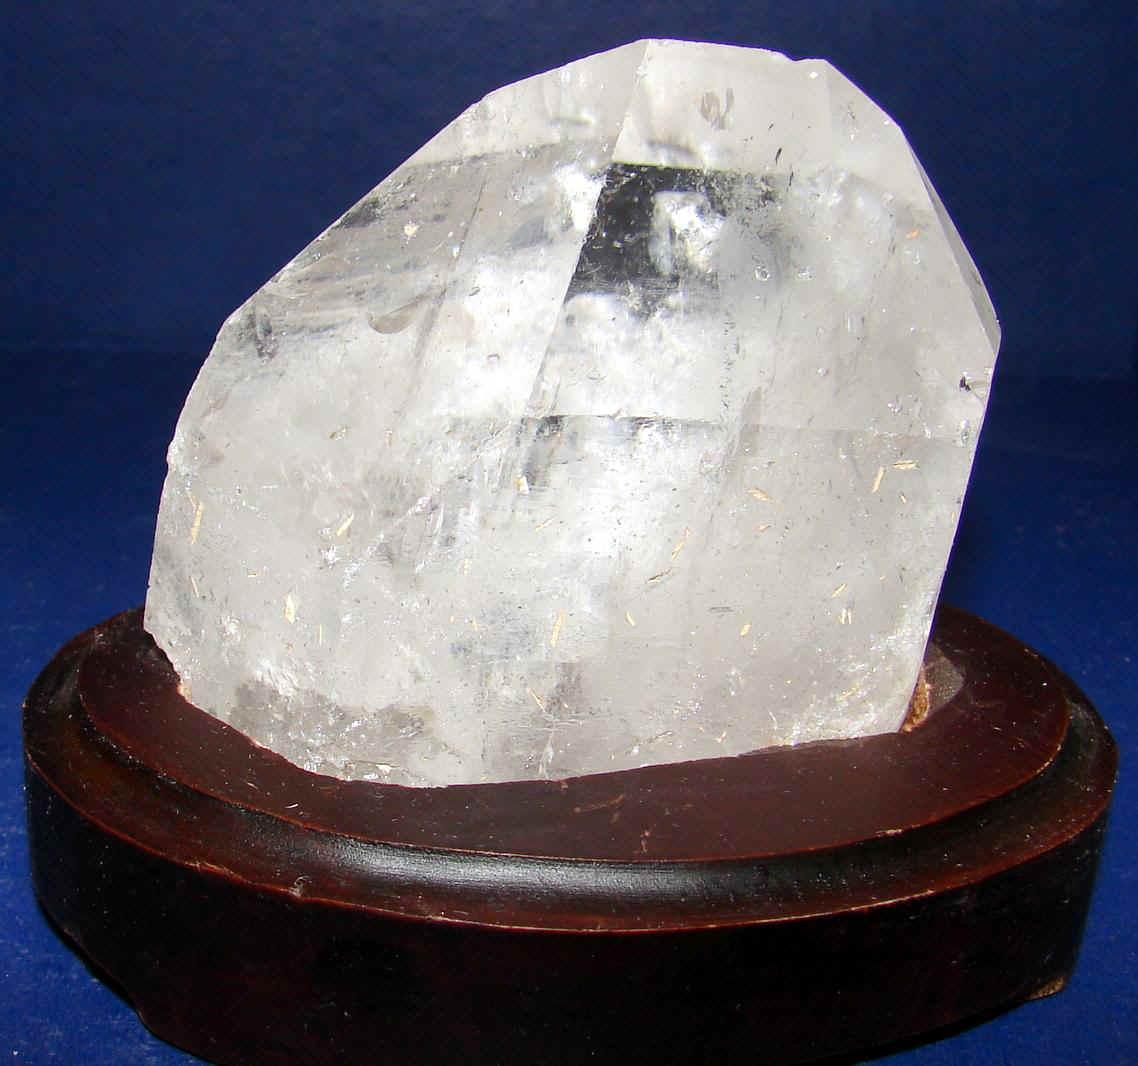 http://www.quartzcrystals.net/woodxl-12.jpg (582341 bytes)